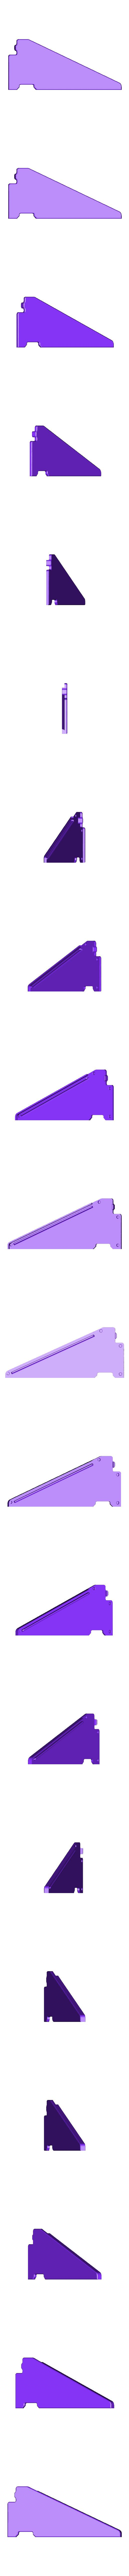 Ender-3_Console Side Cover.STL Download STL file Ender 3 Pro Storage Mod Kit • Object to 3D print, a3rdDimension